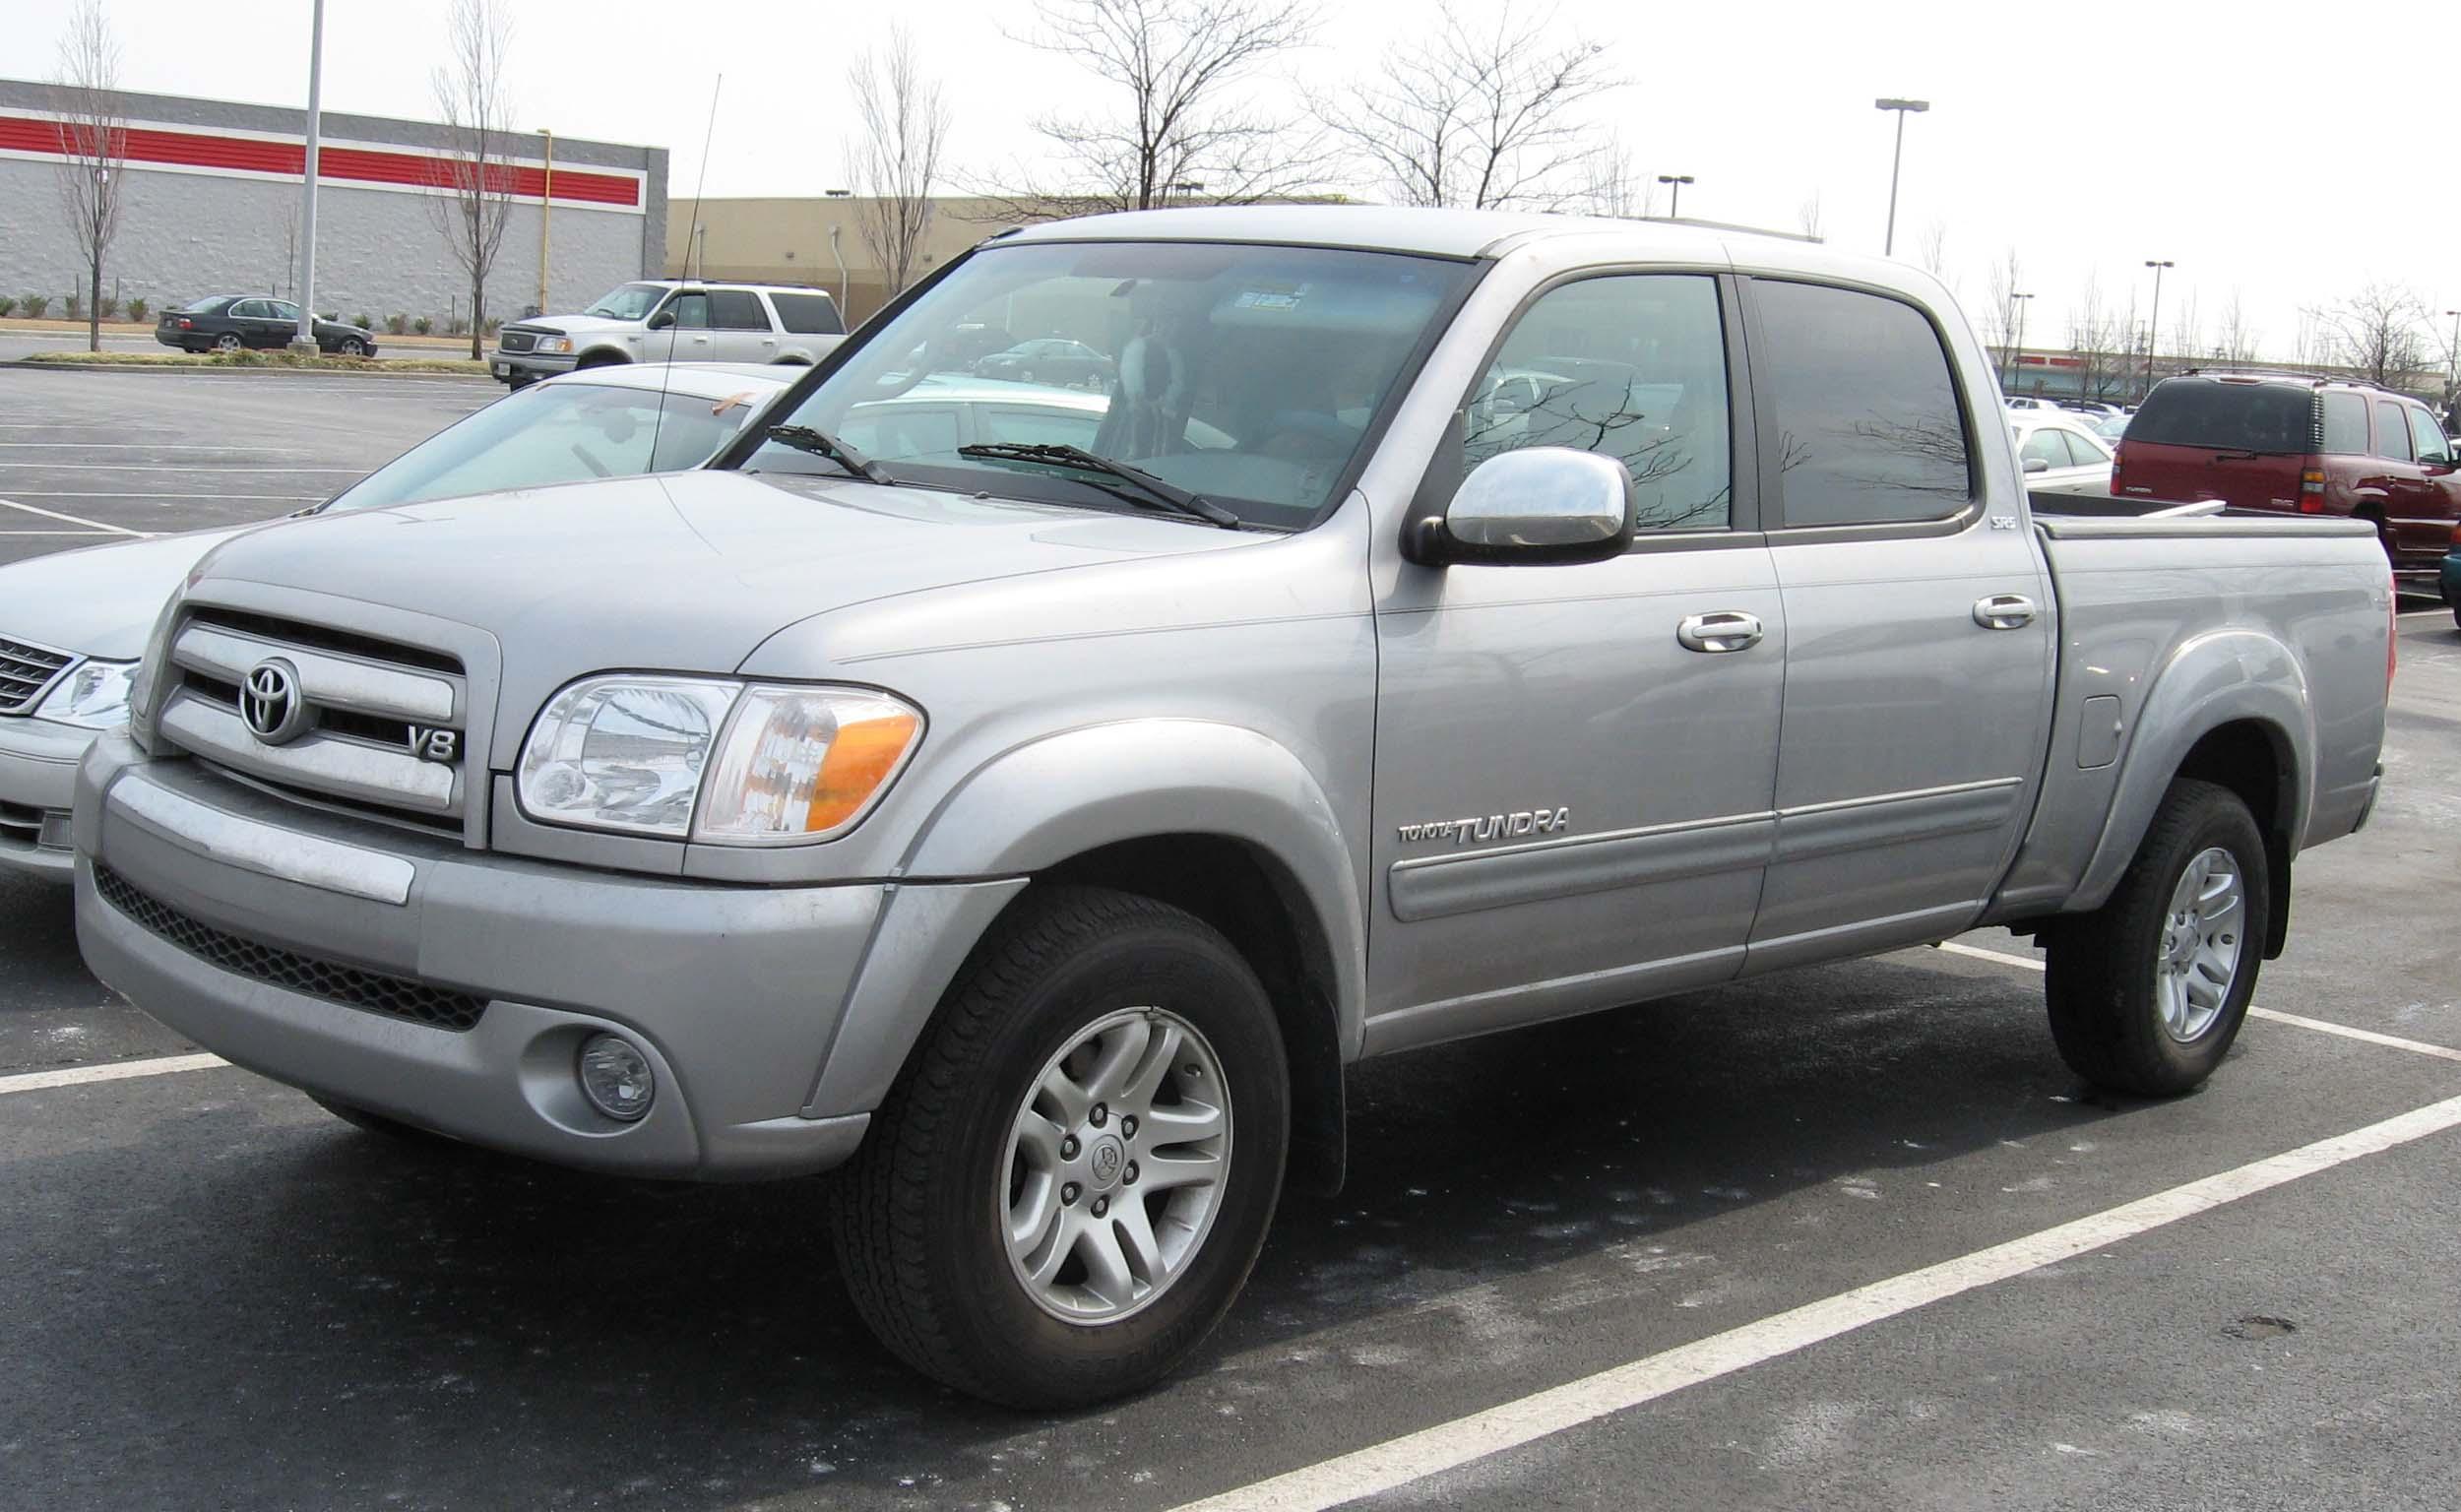 2007 Toyota Tundra Regular Cab >> File:2004-2006 Toyota Tundra DoubleCab.jpg - Wikimedia Commons